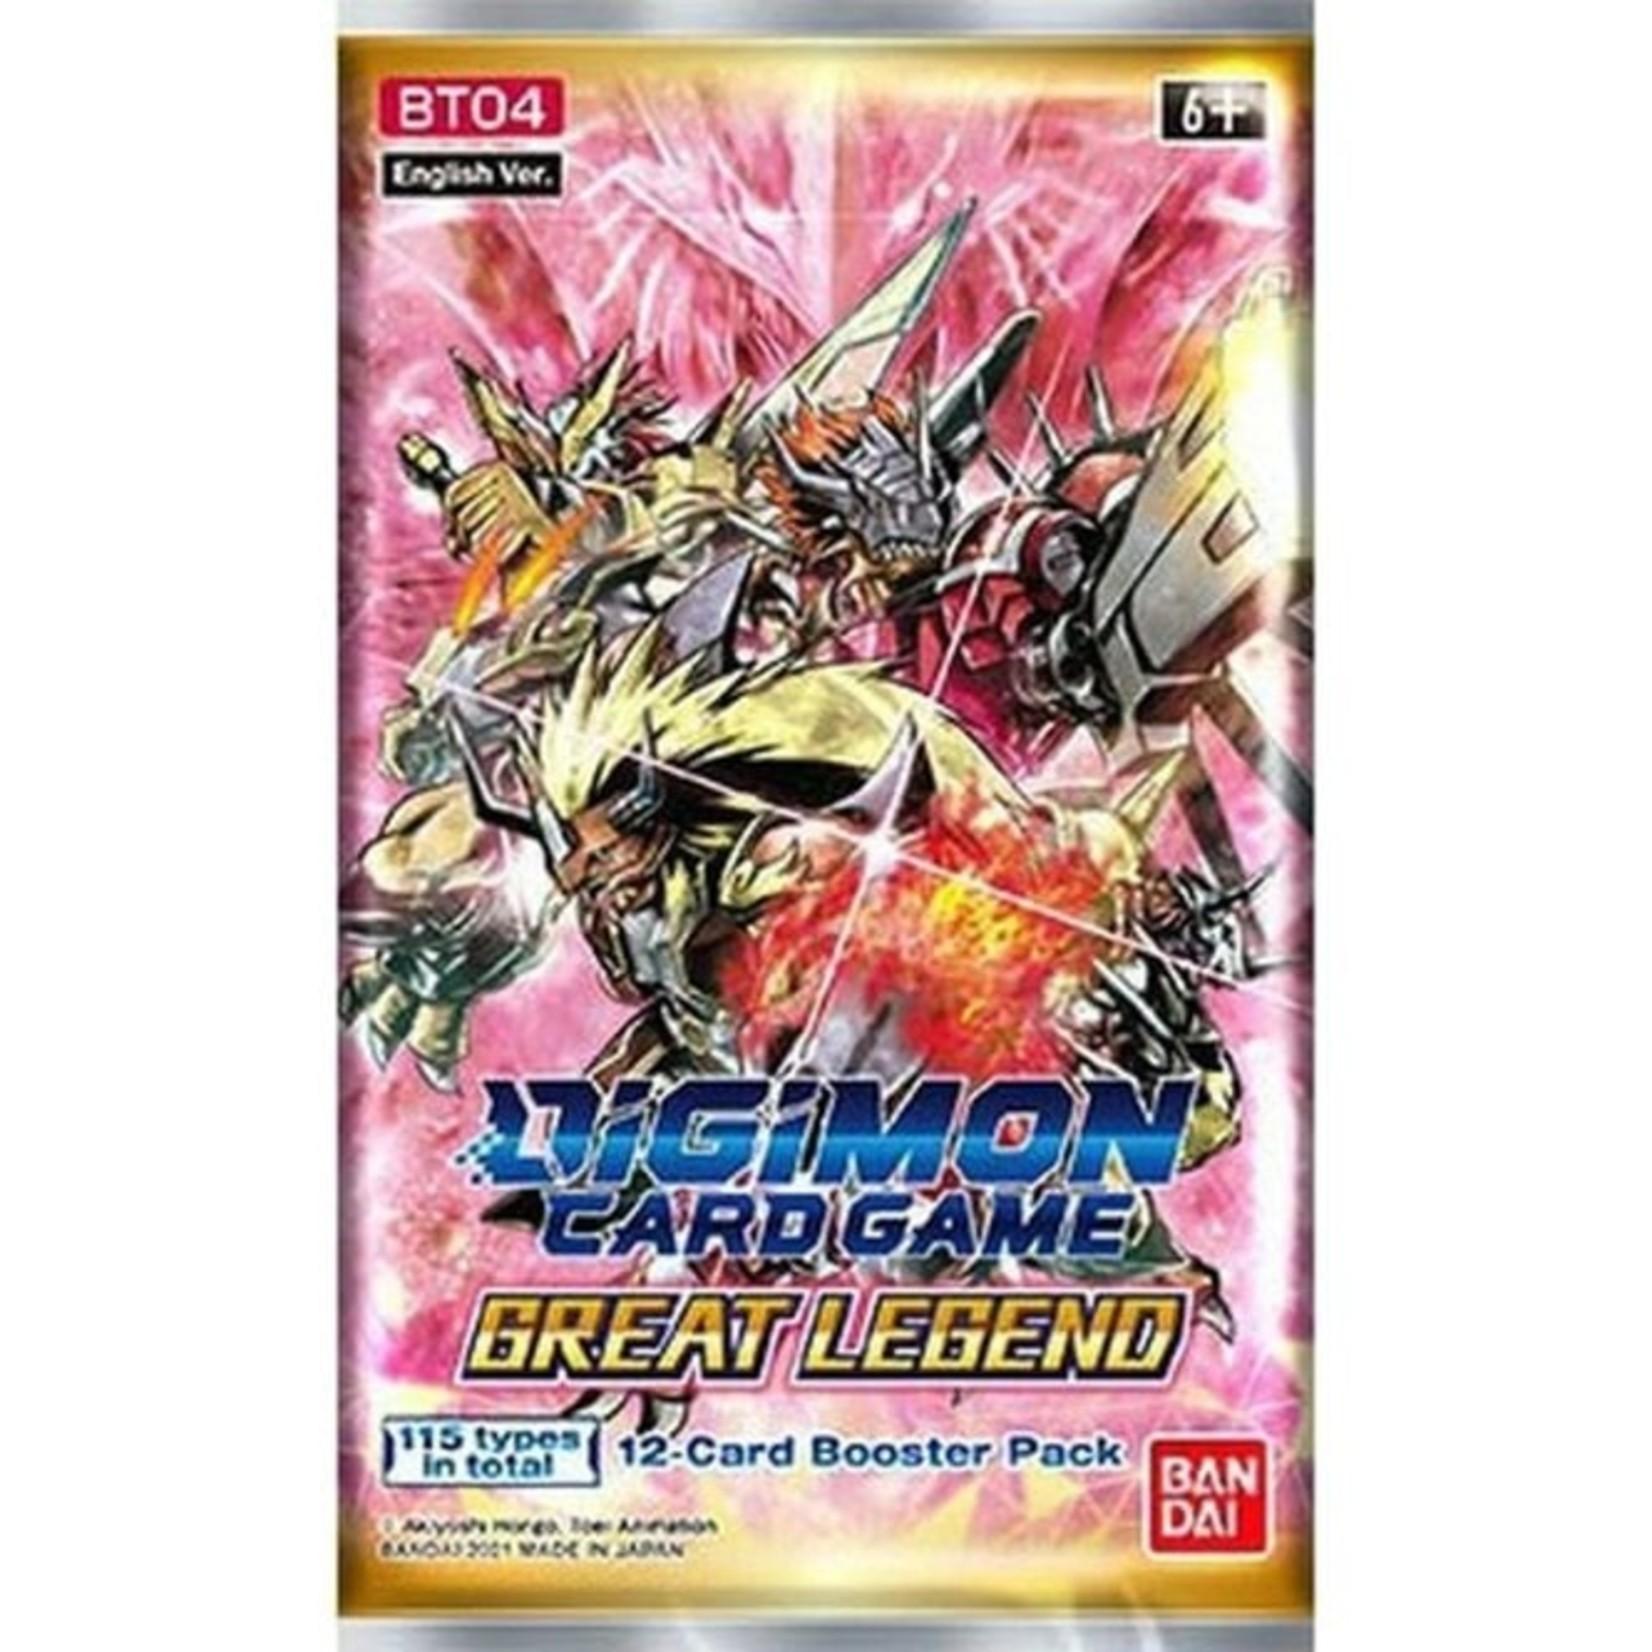 Bandai America, Inc. Digimon TCG: Great Legend Booster Pack